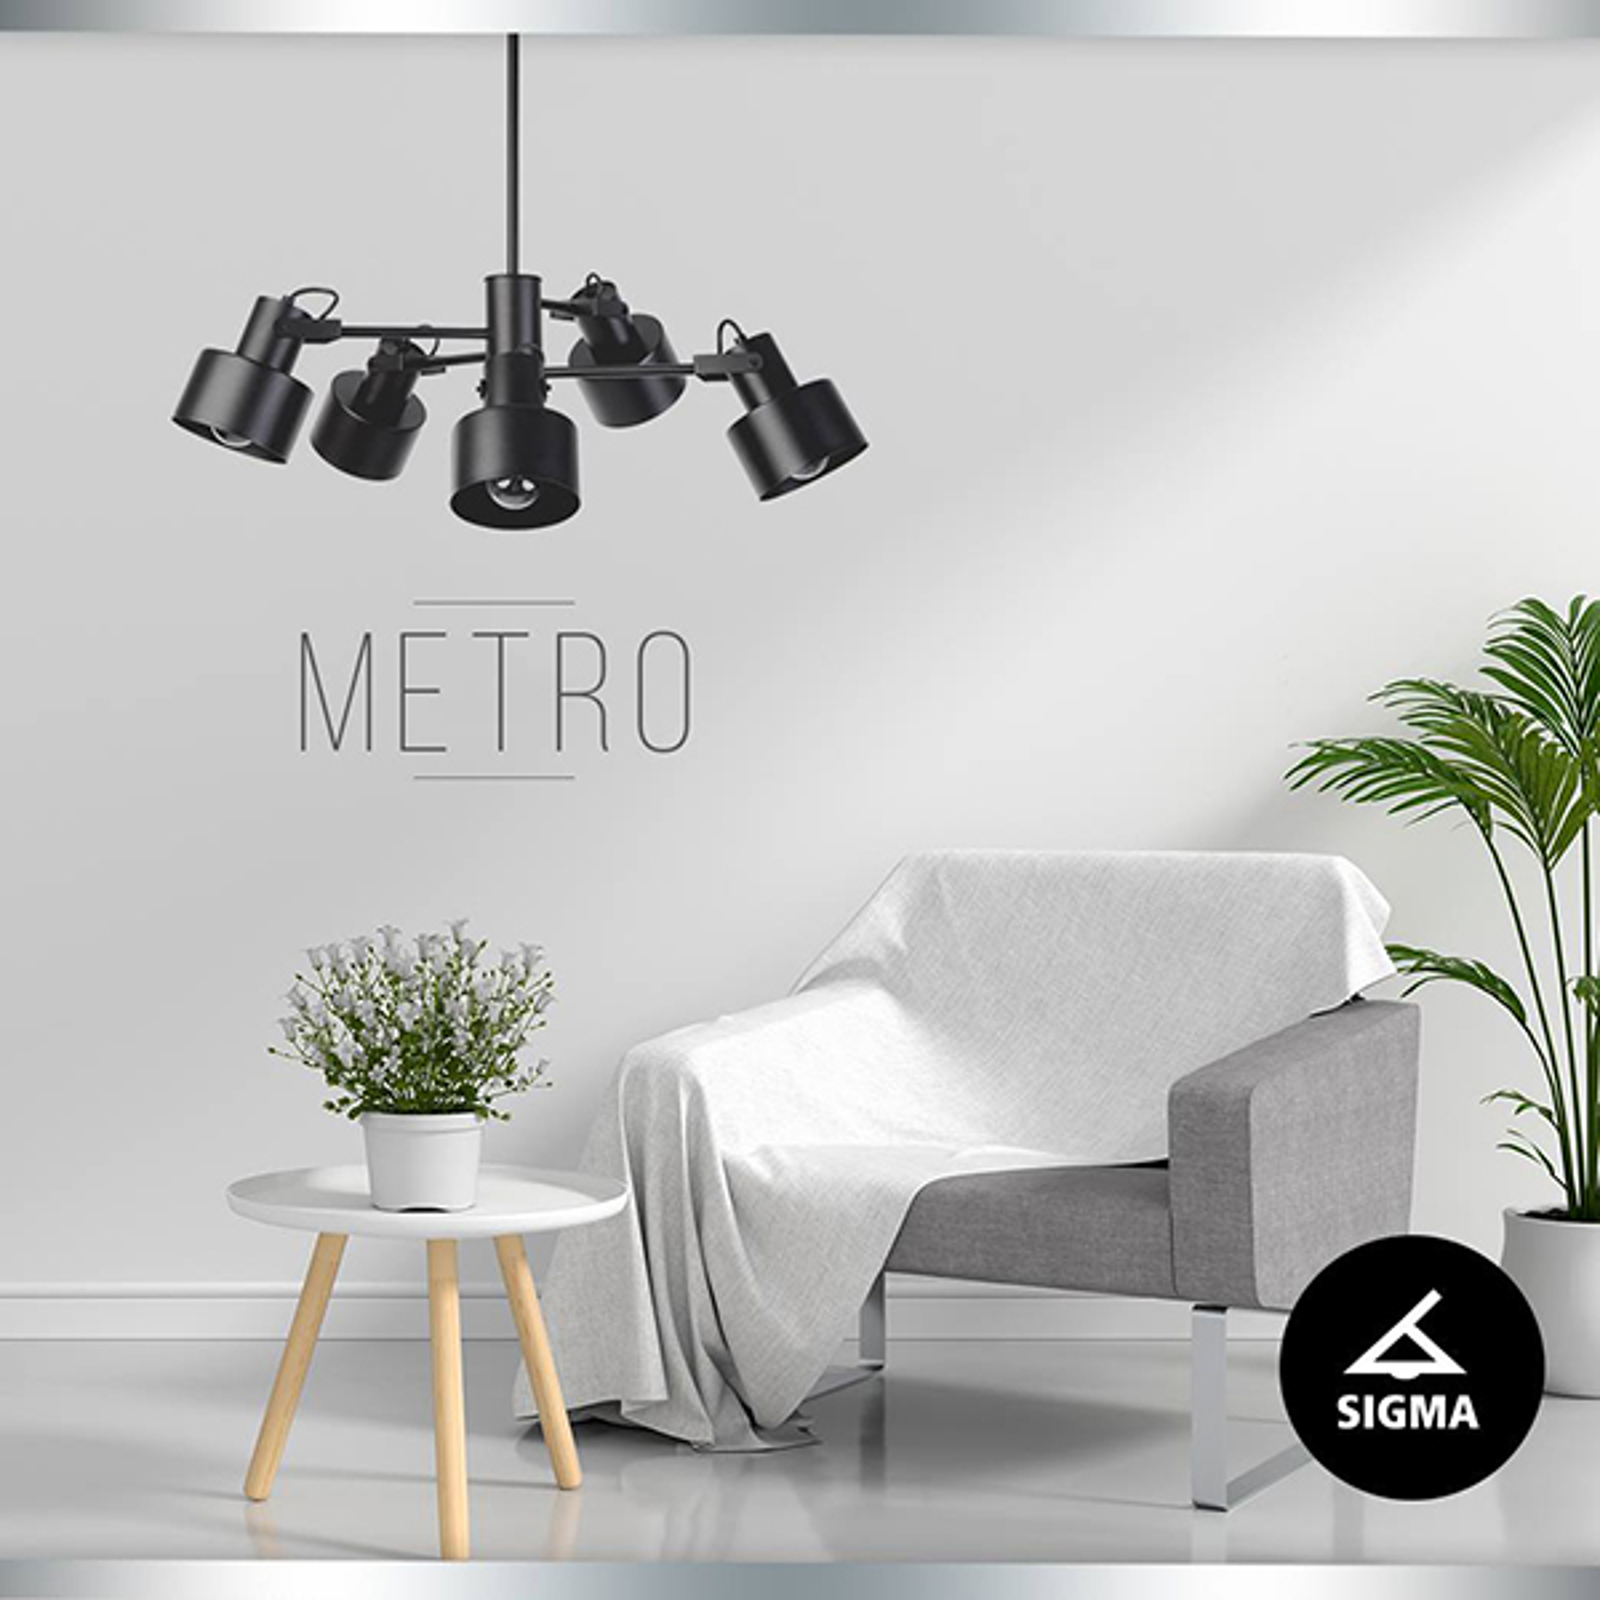 Lampa wisząca Metro, 5-punktowa, czarna